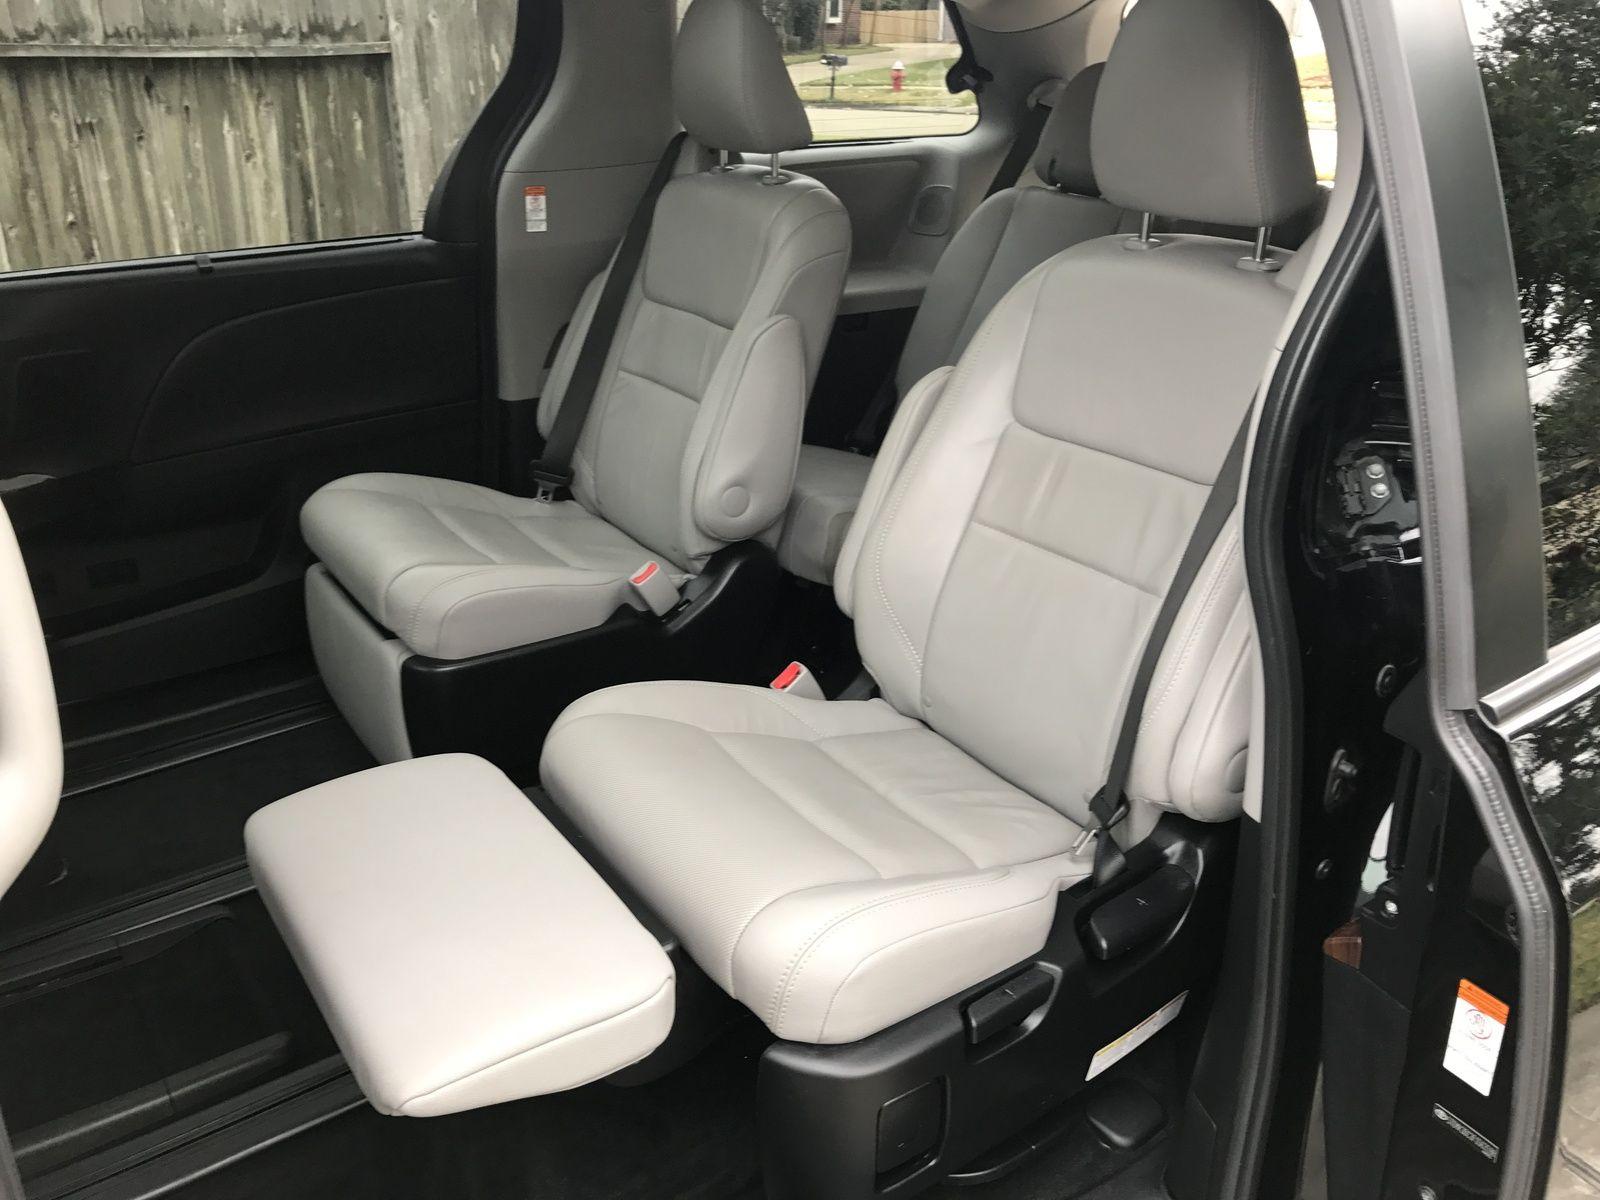 2015 Toyota Sienna Limited 7 Passenger Premium Toyota Sienna Mini Van 2015 Toyota